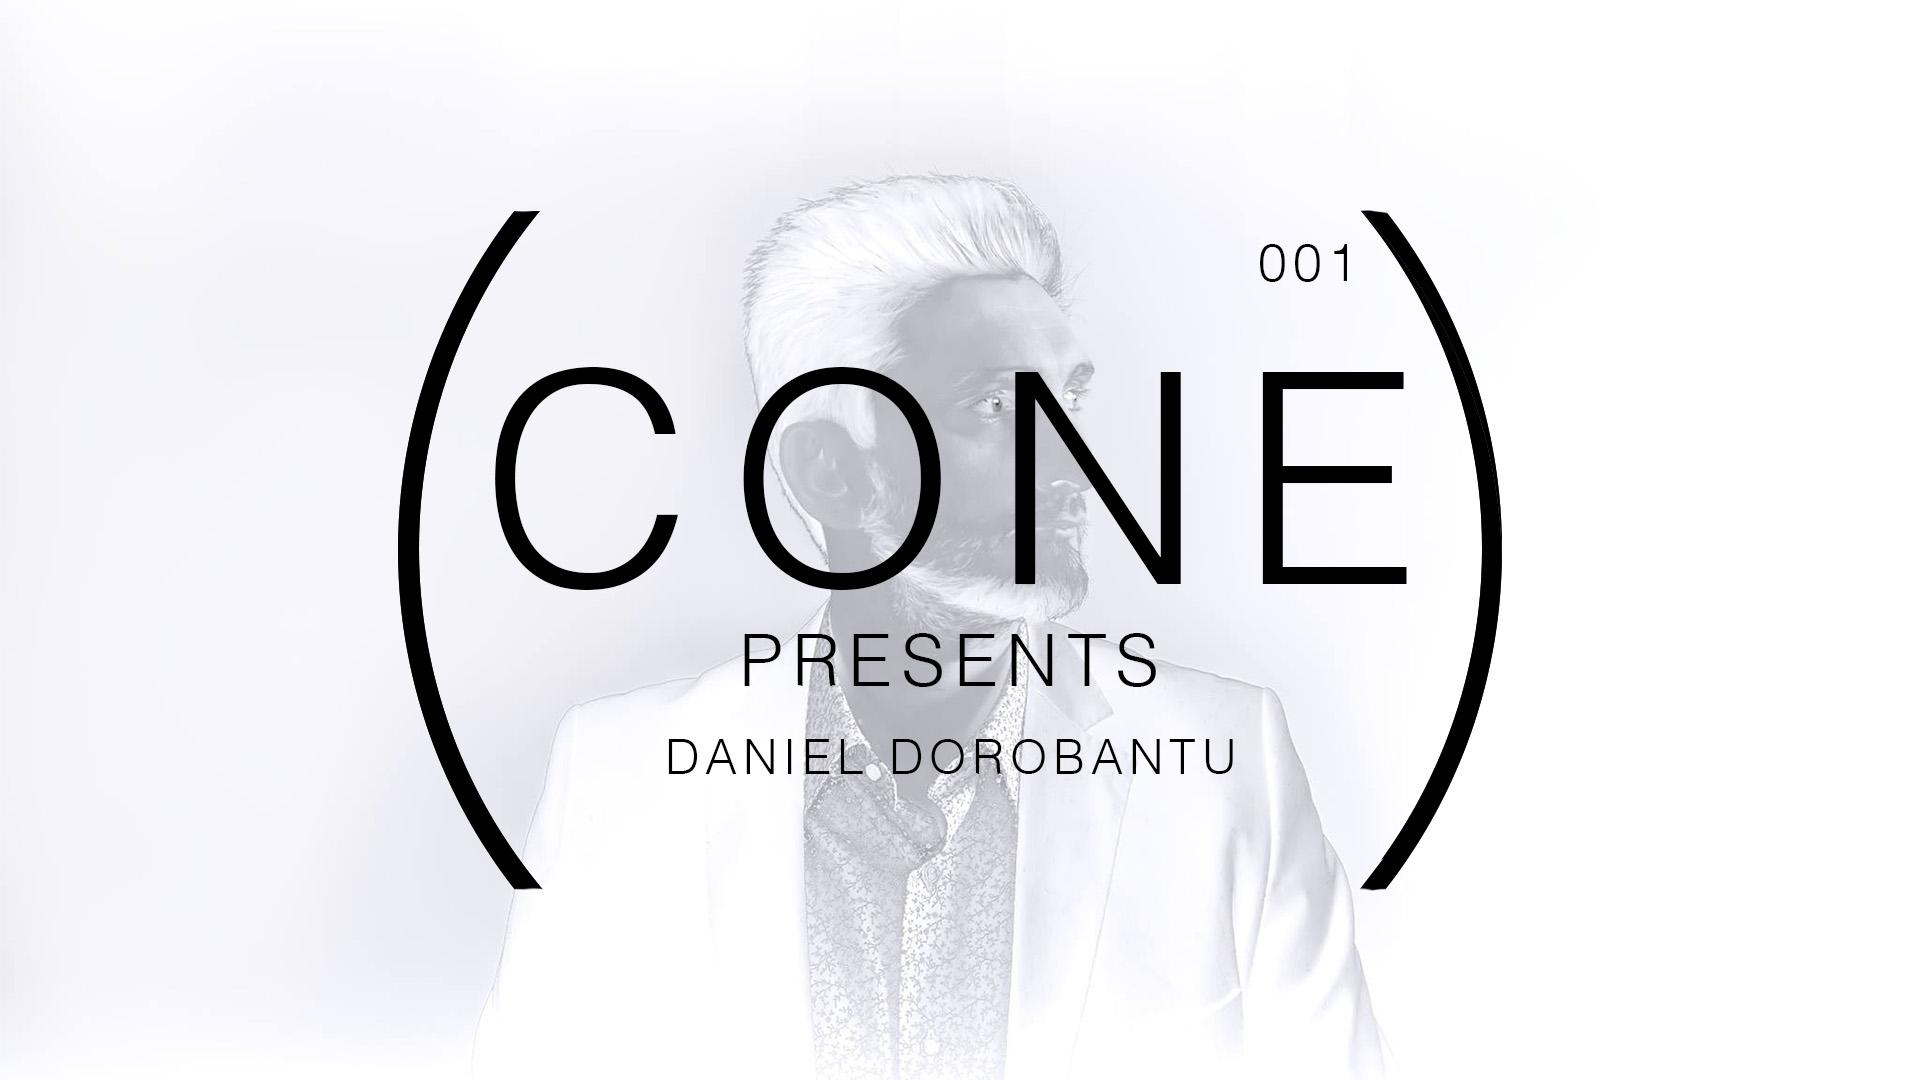 Cone Presents romanin ambience producer Daniel Dorobantu